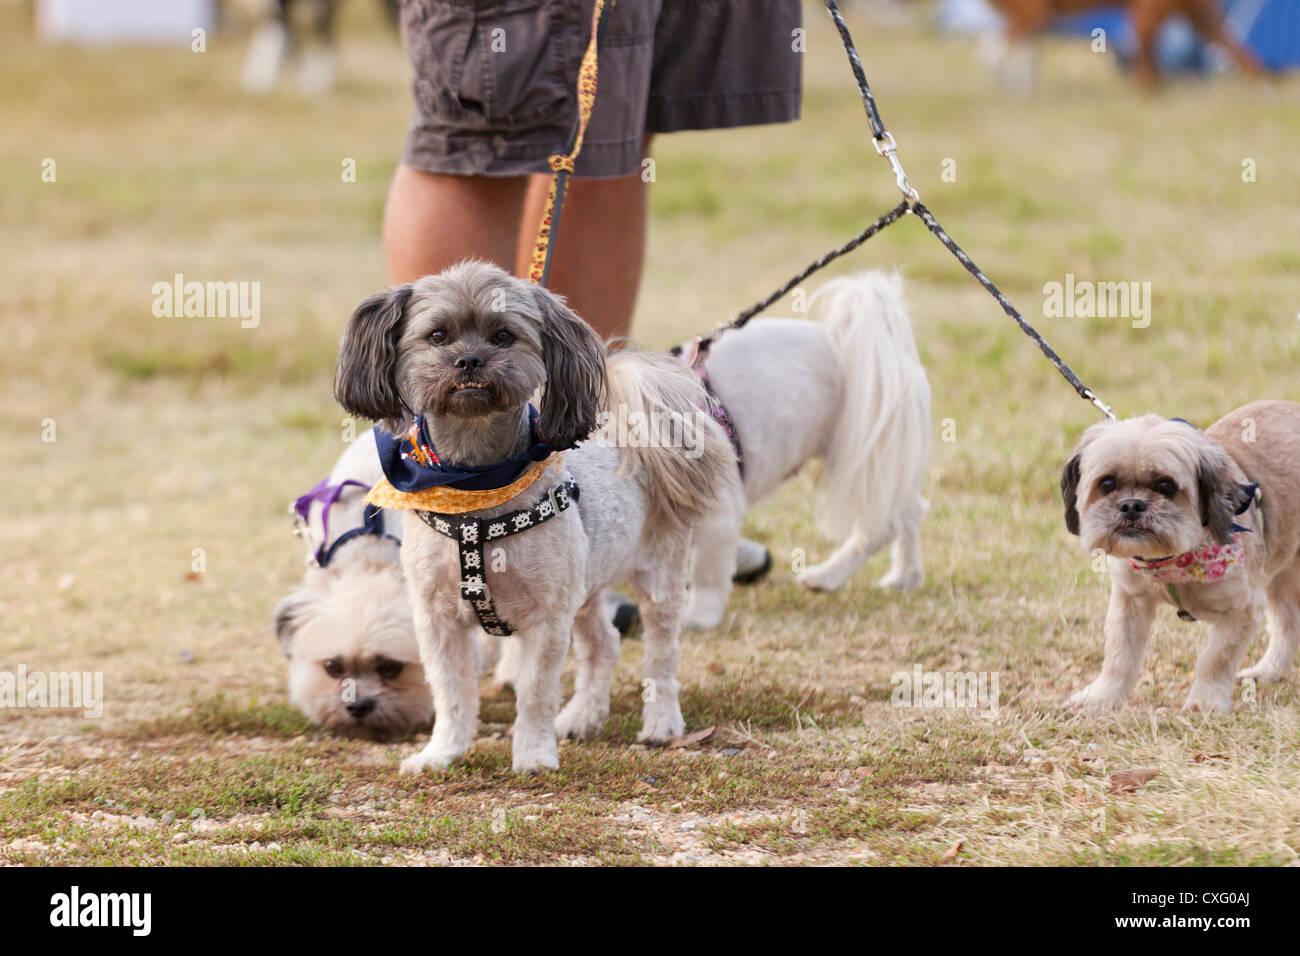 Small dogs on leash - USA - Stock Image